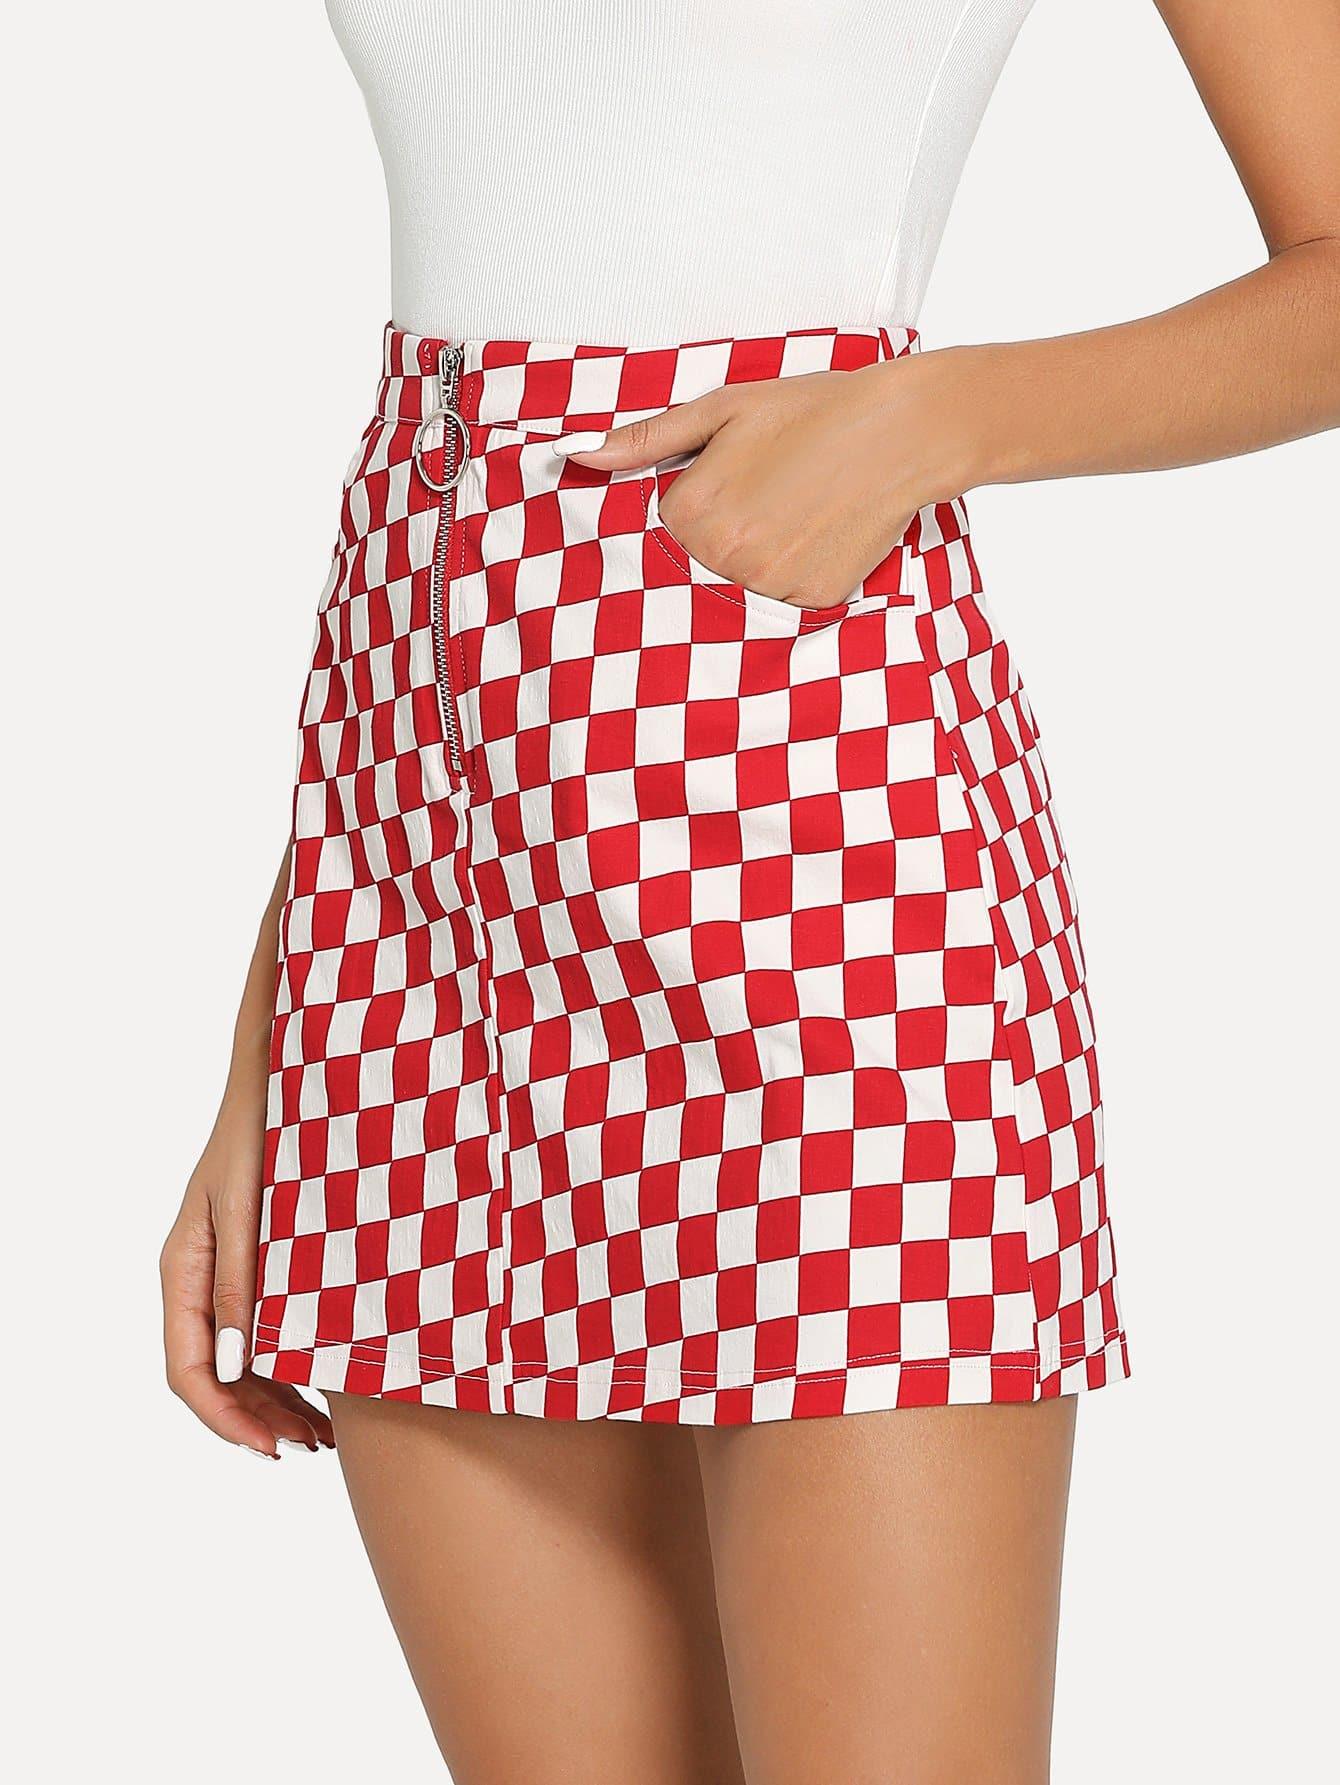 Купить O-Ring Zipper Передняя проверенная юбка, Giulia, SheIn